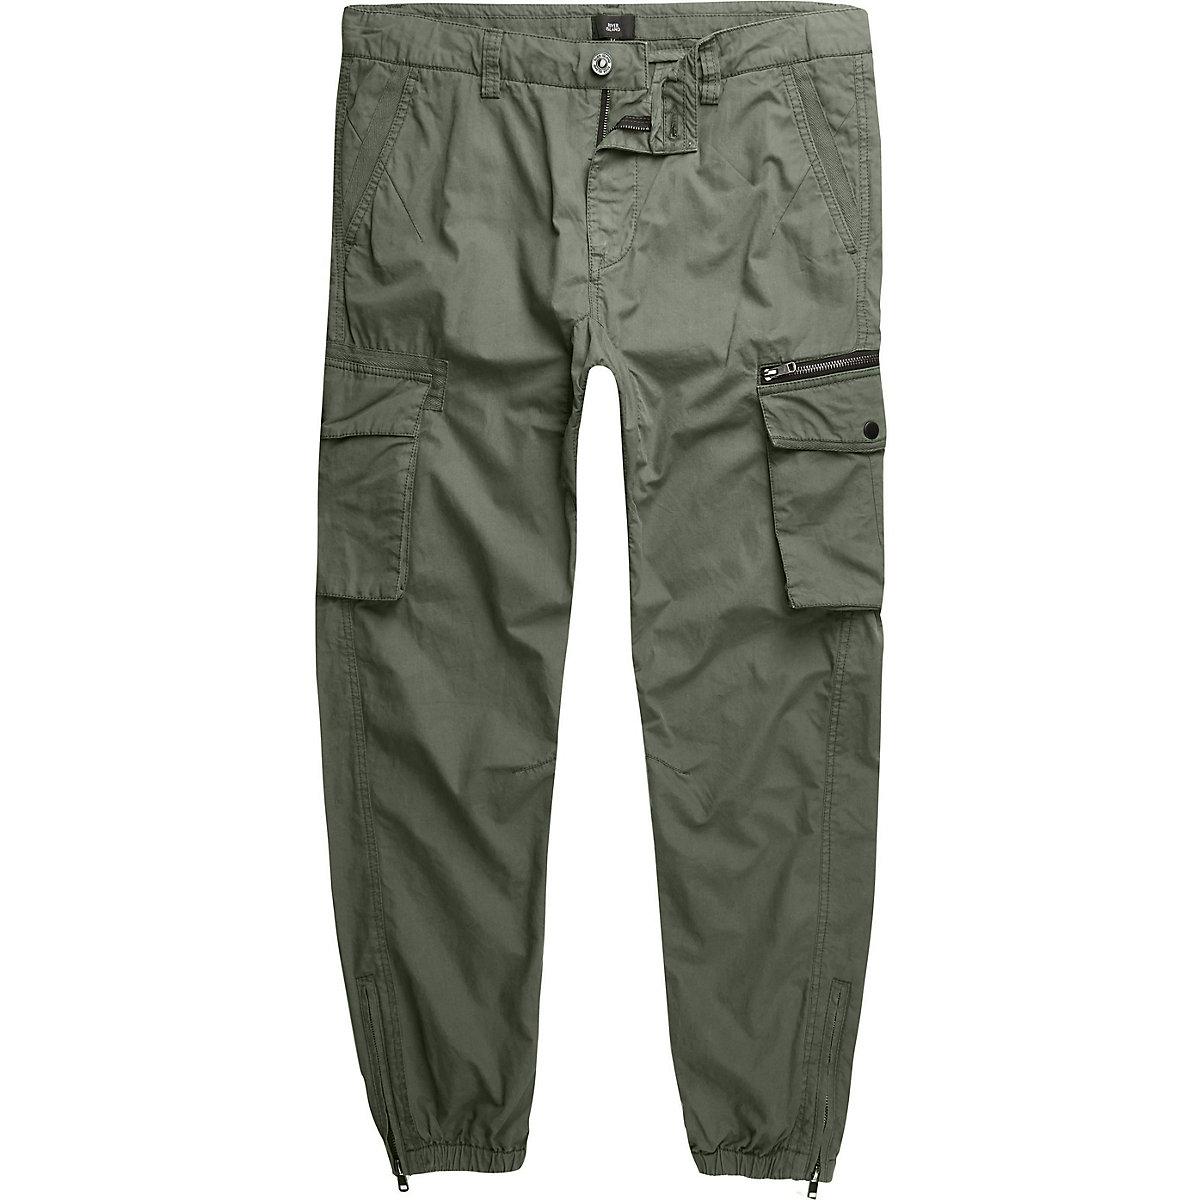 Big and Tall khaki green cargo pants